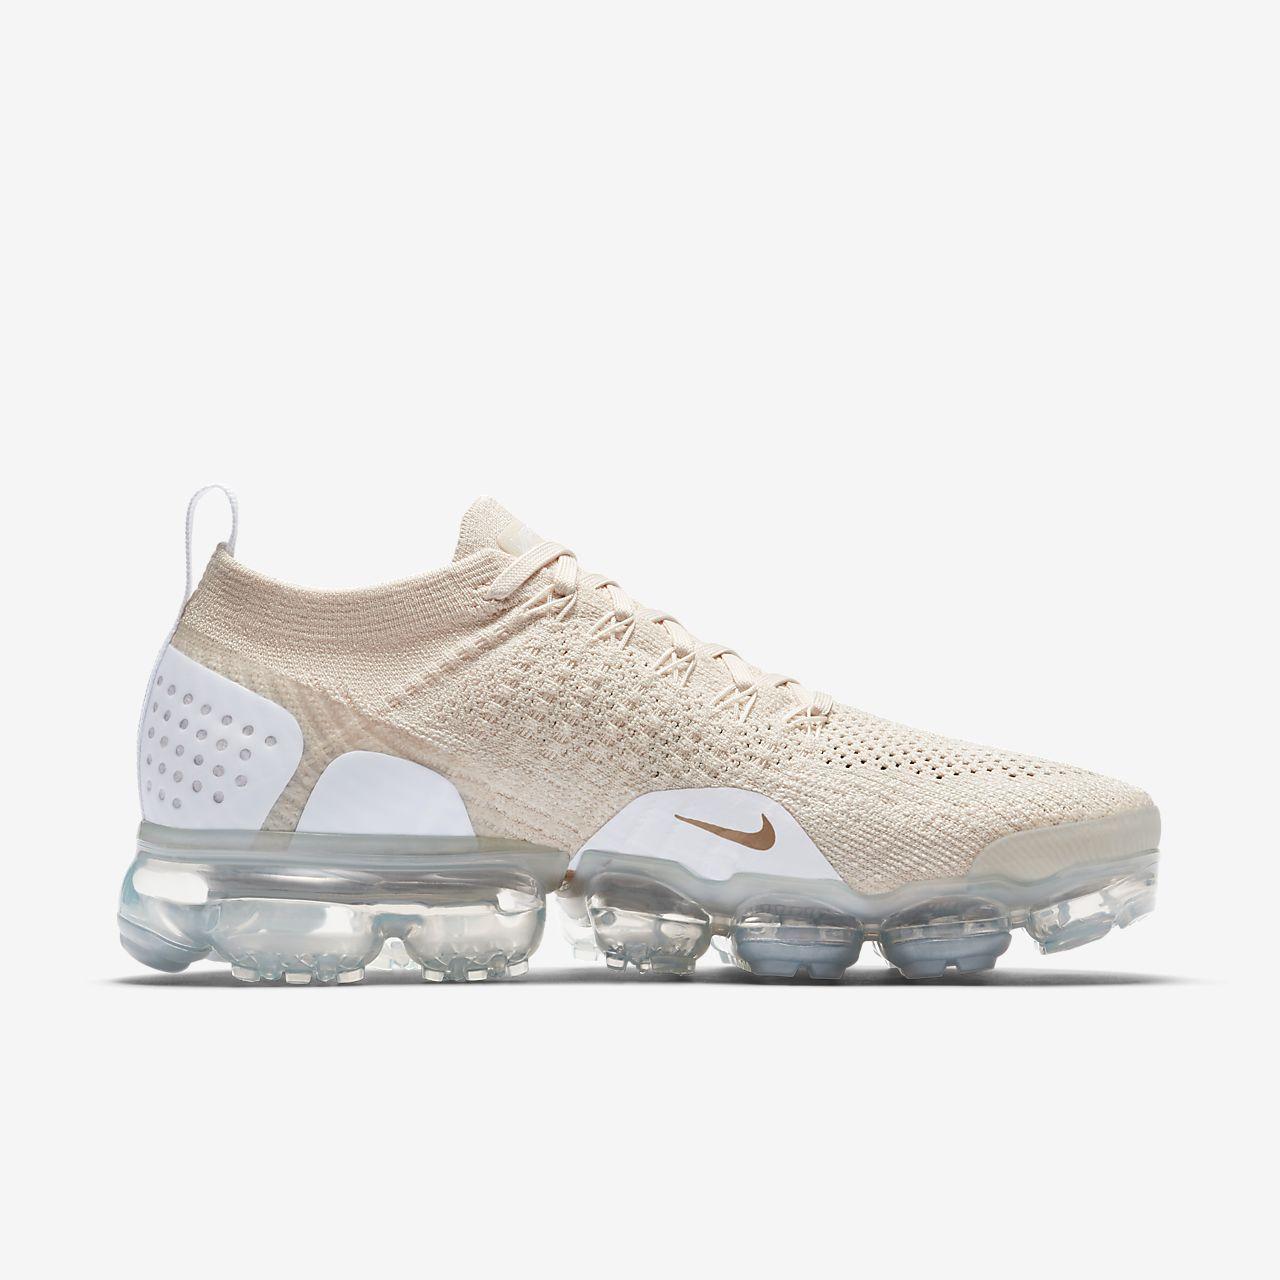 new style a9371 5052e ... Nike Air VaporMax Flyknit 2 Womens Shoe